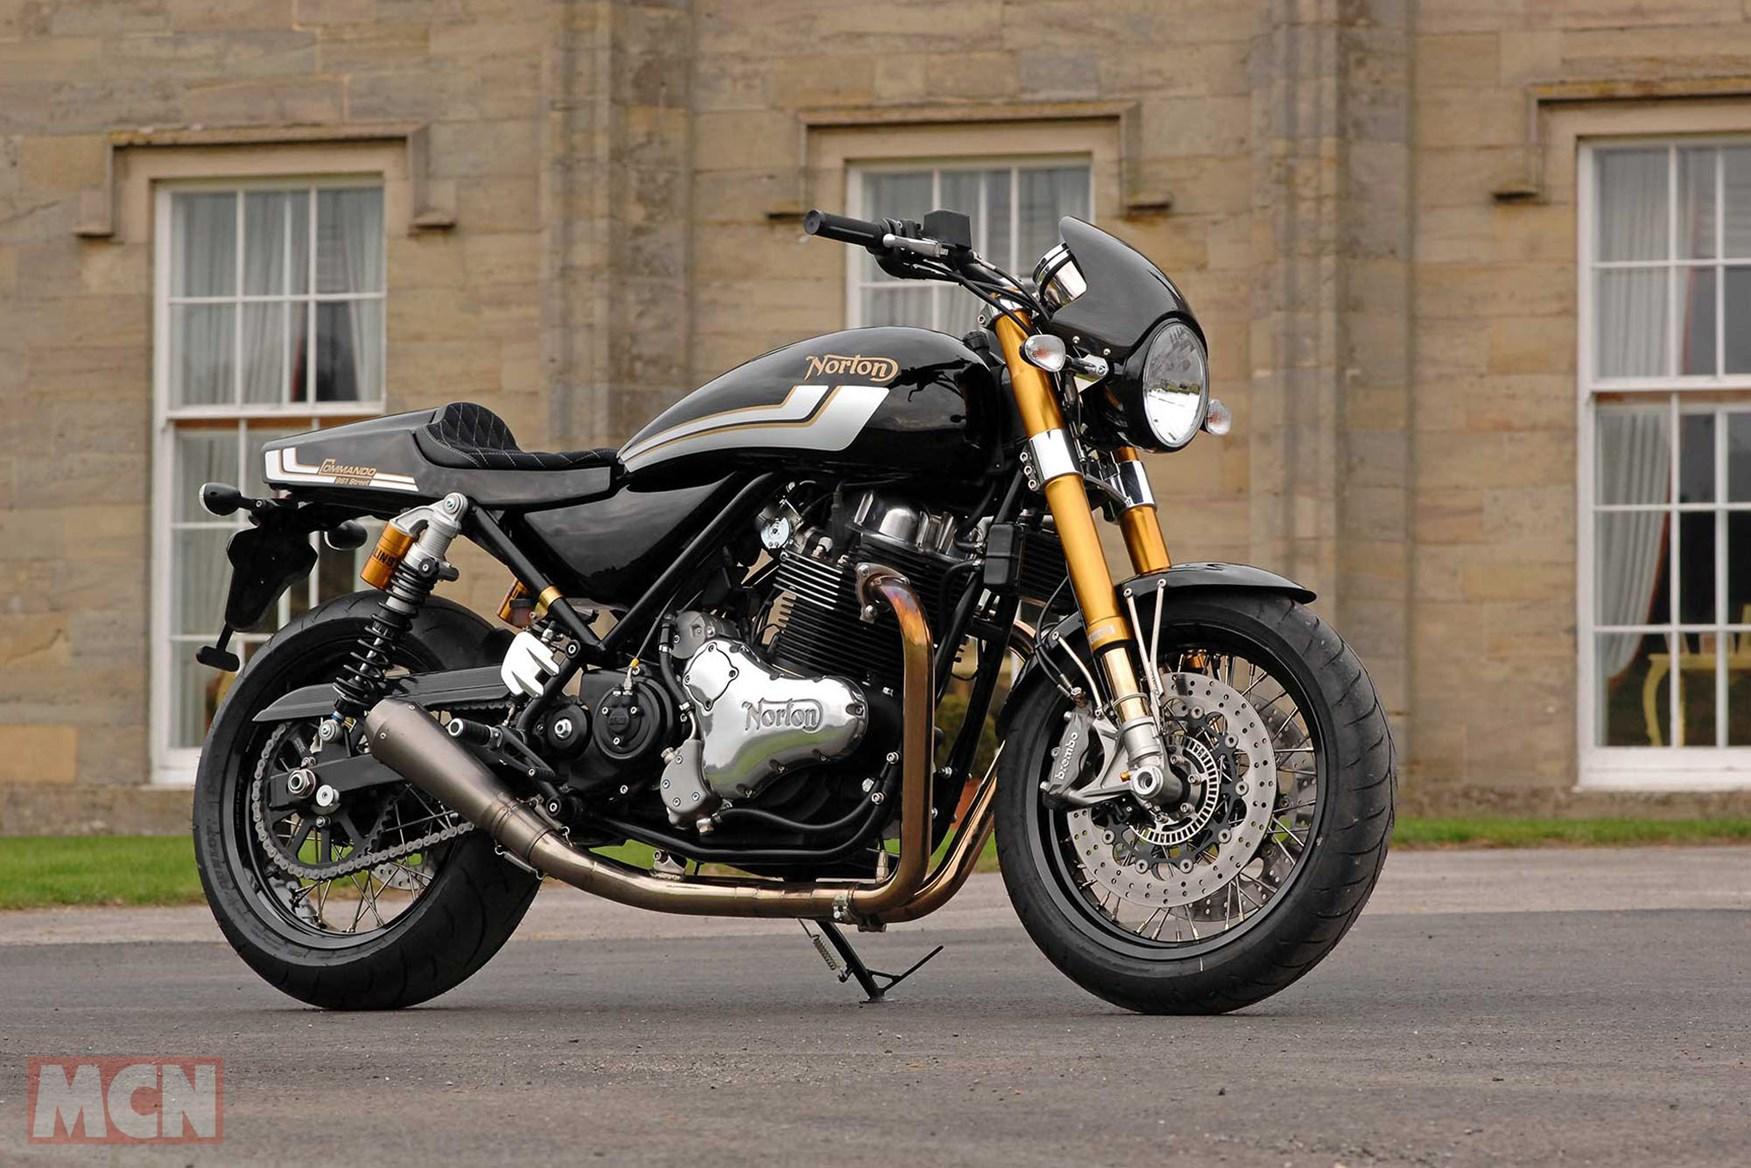 Inside story: Stunning Norton Commando 961 Street will be 50-bike